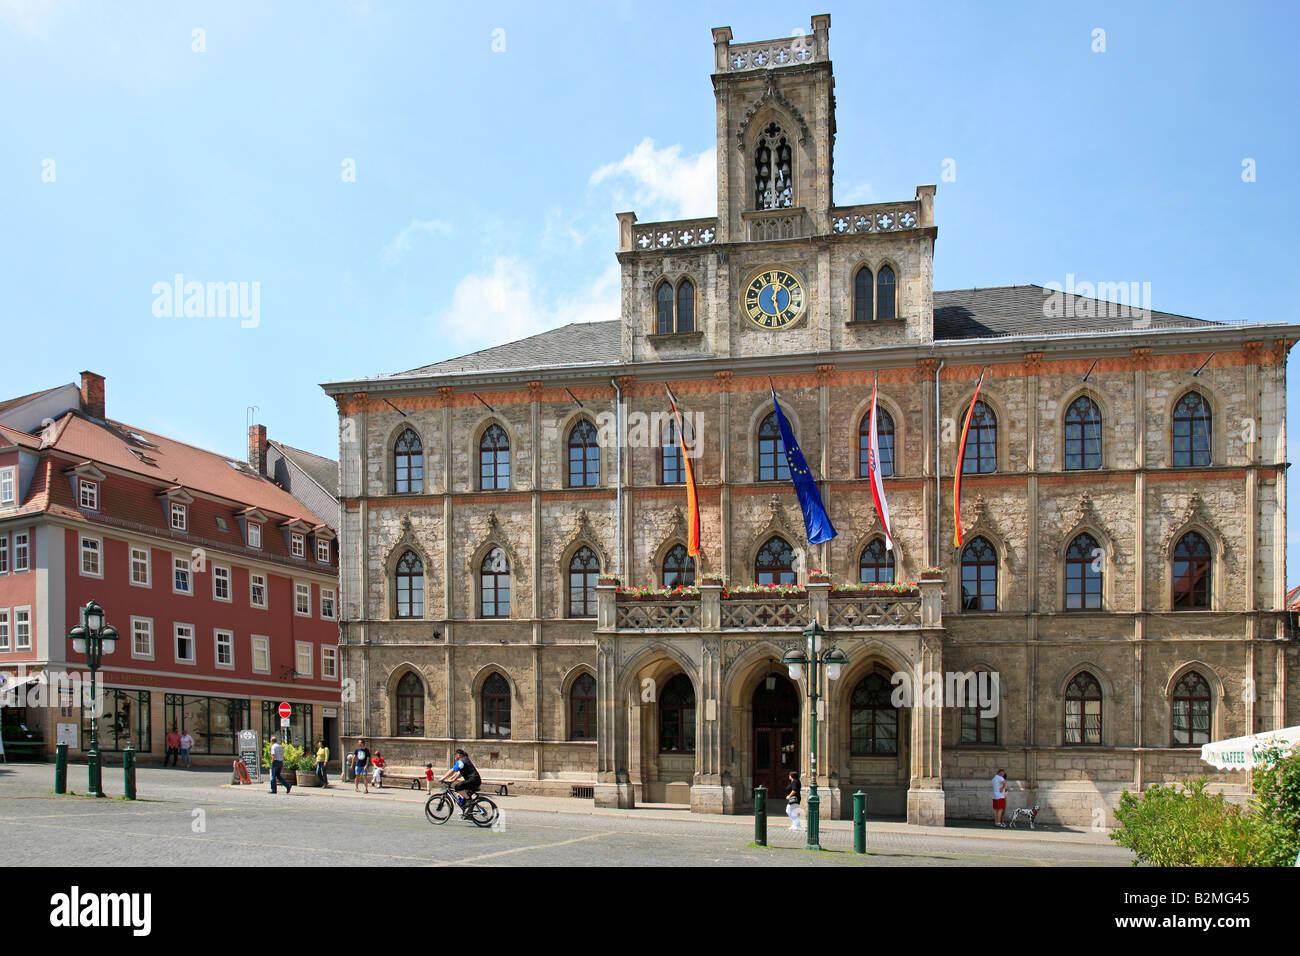 town hall of Weimar in Germany, Europe; Neptunbrunnen vor dem Rathaus in Weimar Stock Photo